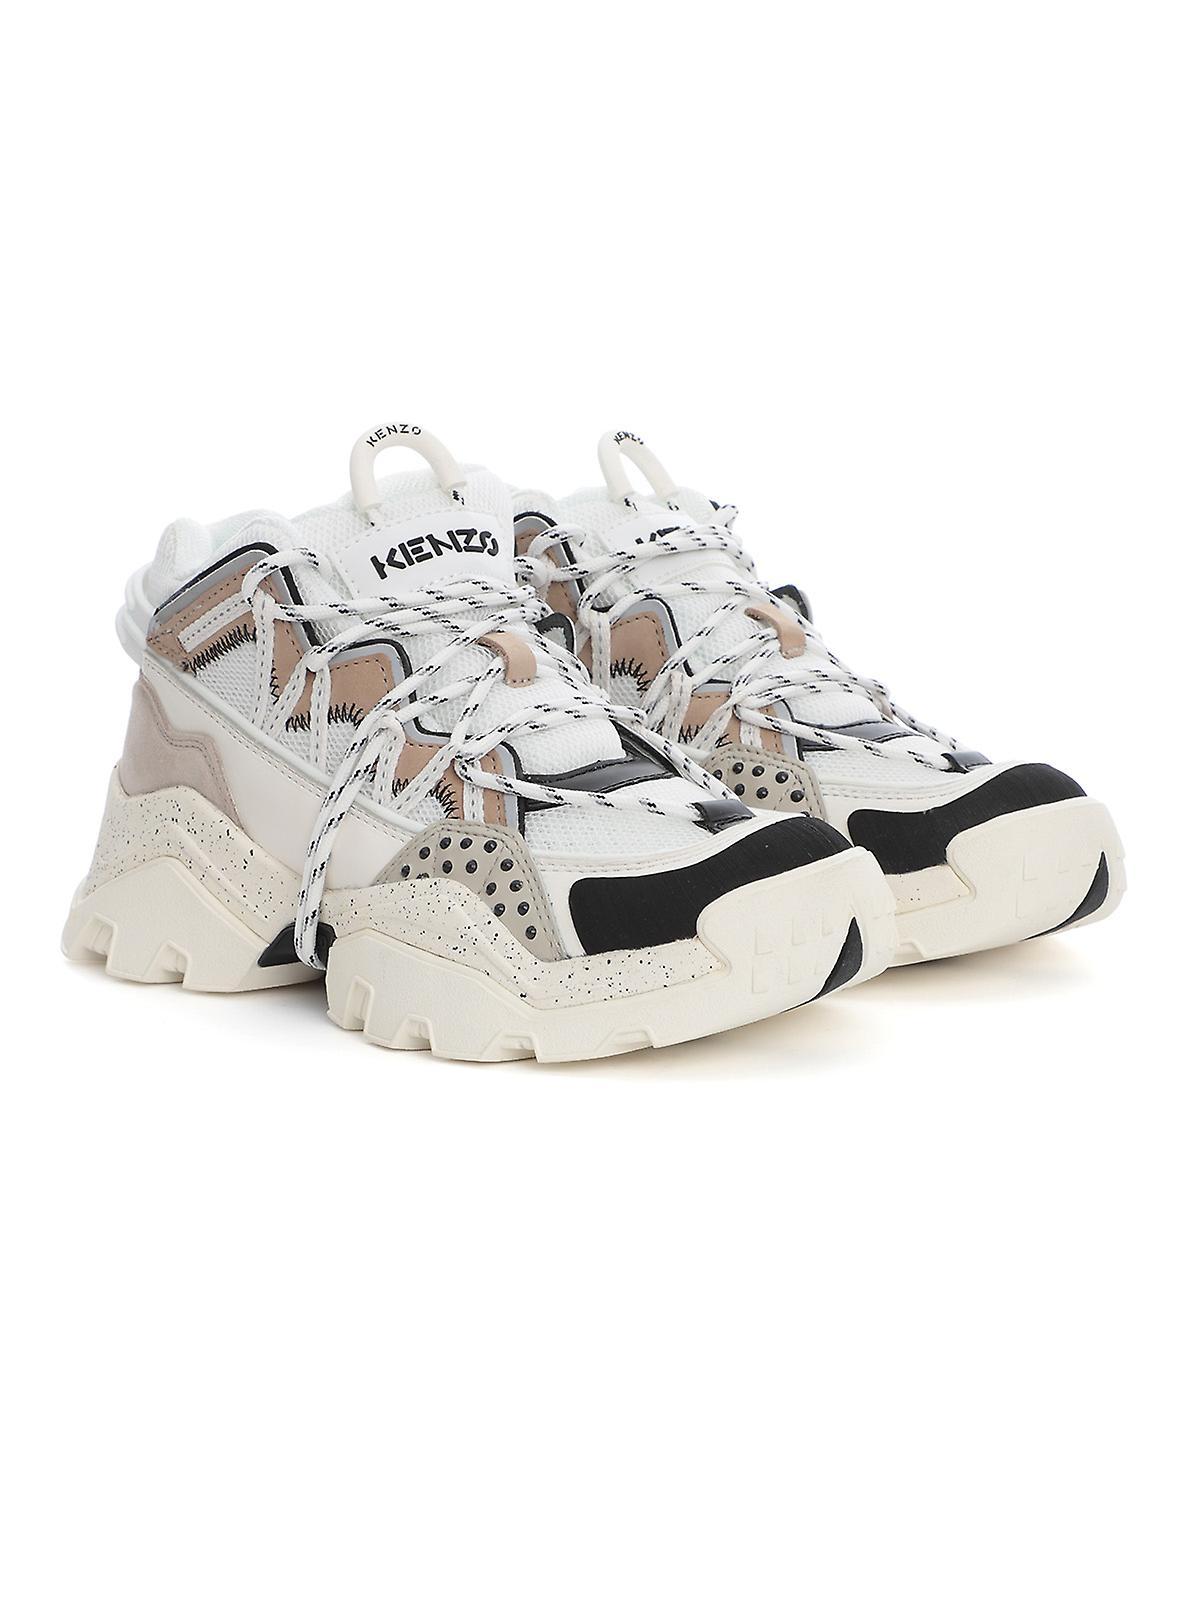 Kenzo Fa62sn300l6993 Women's Beige Leather Hi Top Sneakers